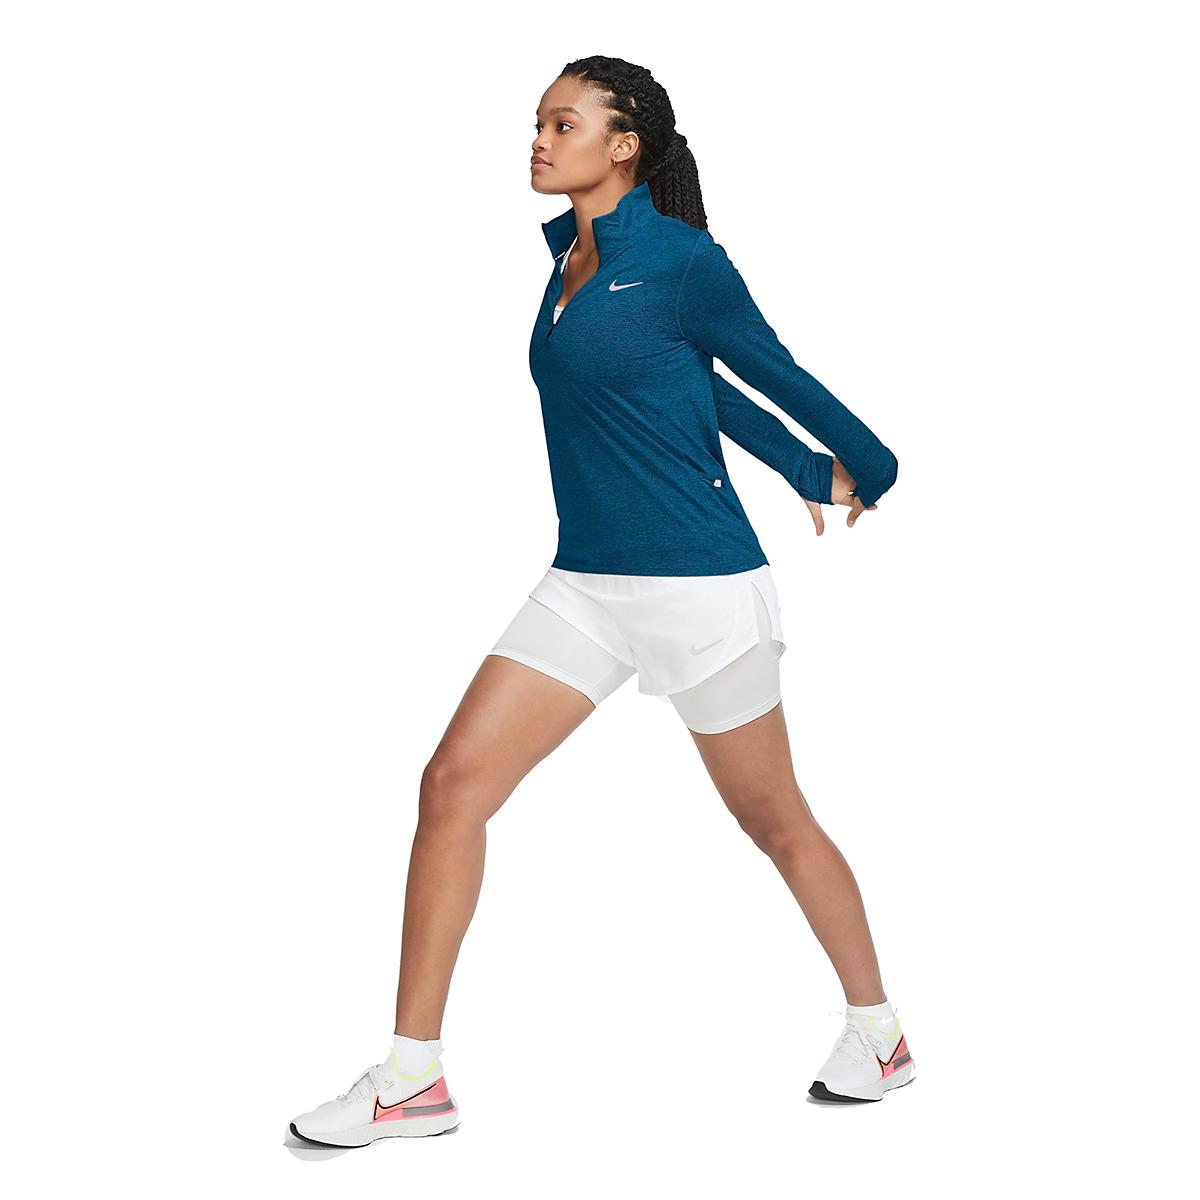 Women's Nike Nike Element 1/2-Zip Running Top - Color: Deep Ocean/Green - Size: XS, Deep Ocean/Green, large, image 3